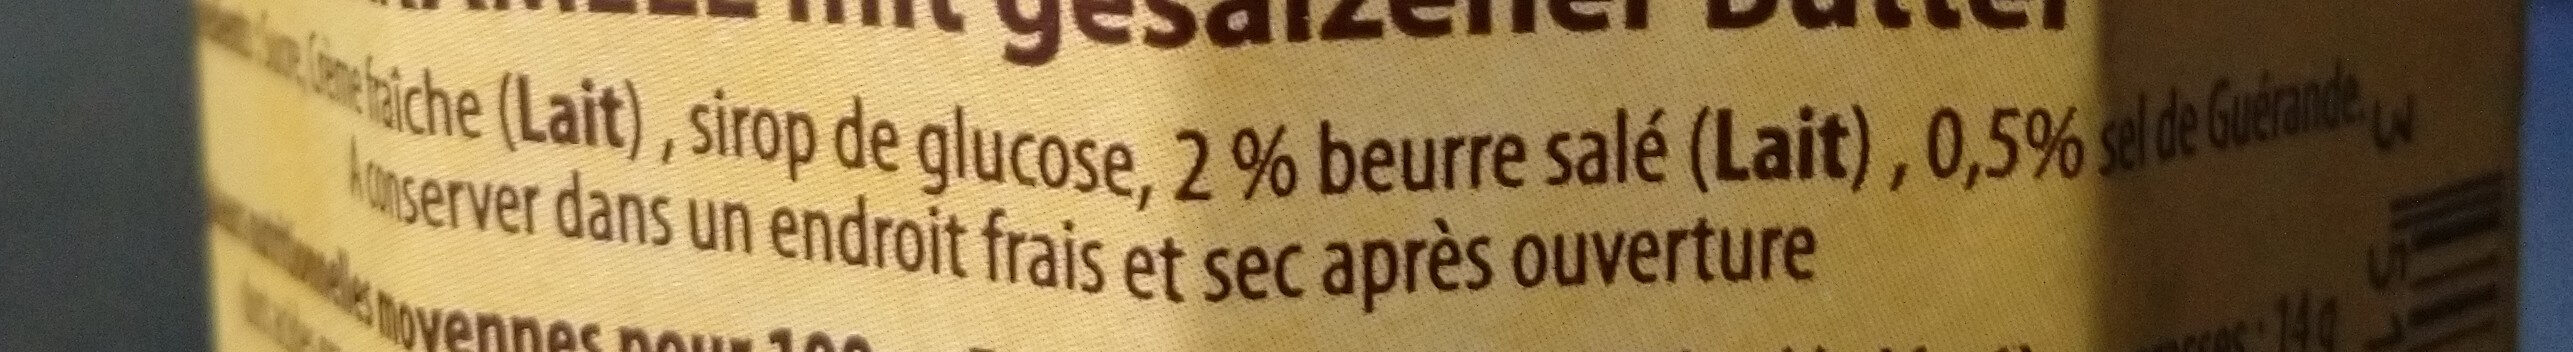 Crème de caramel - Ingredients - fr